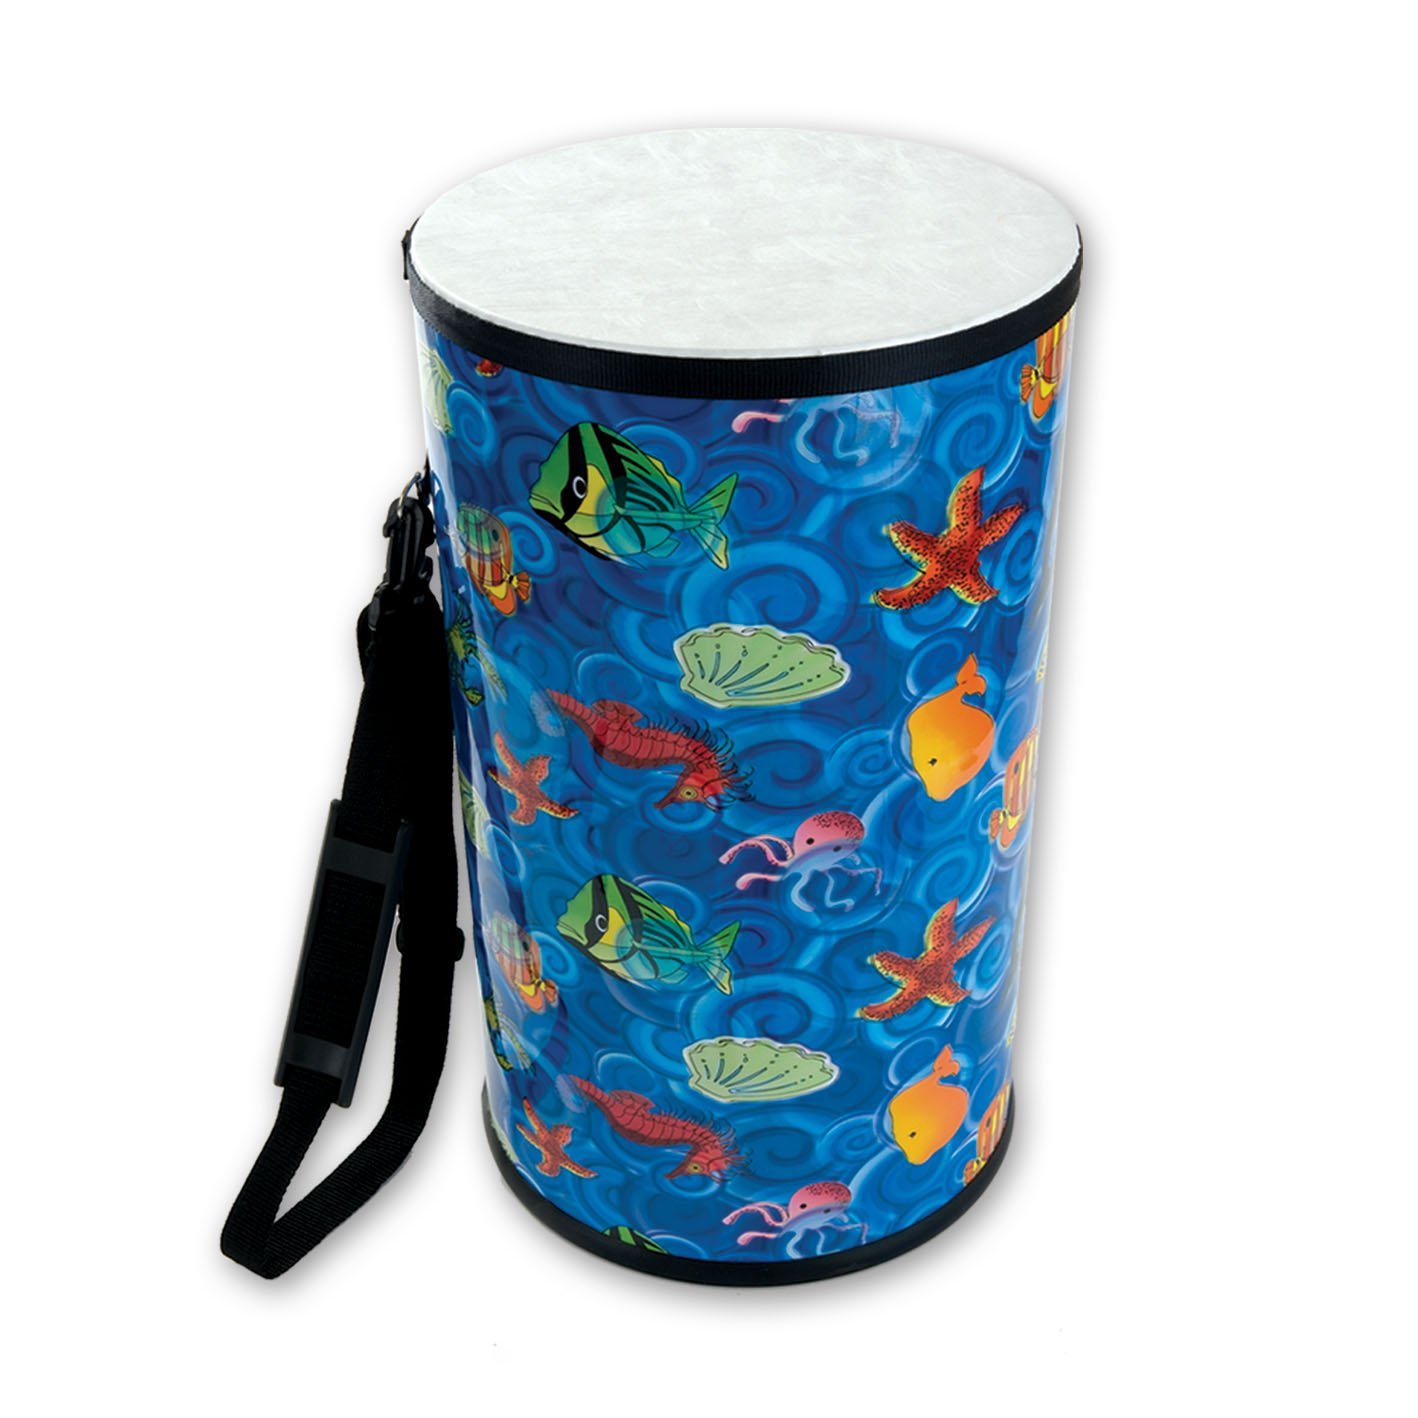 Percussion Plus Tubano Ocean Fish by Percussion Plus